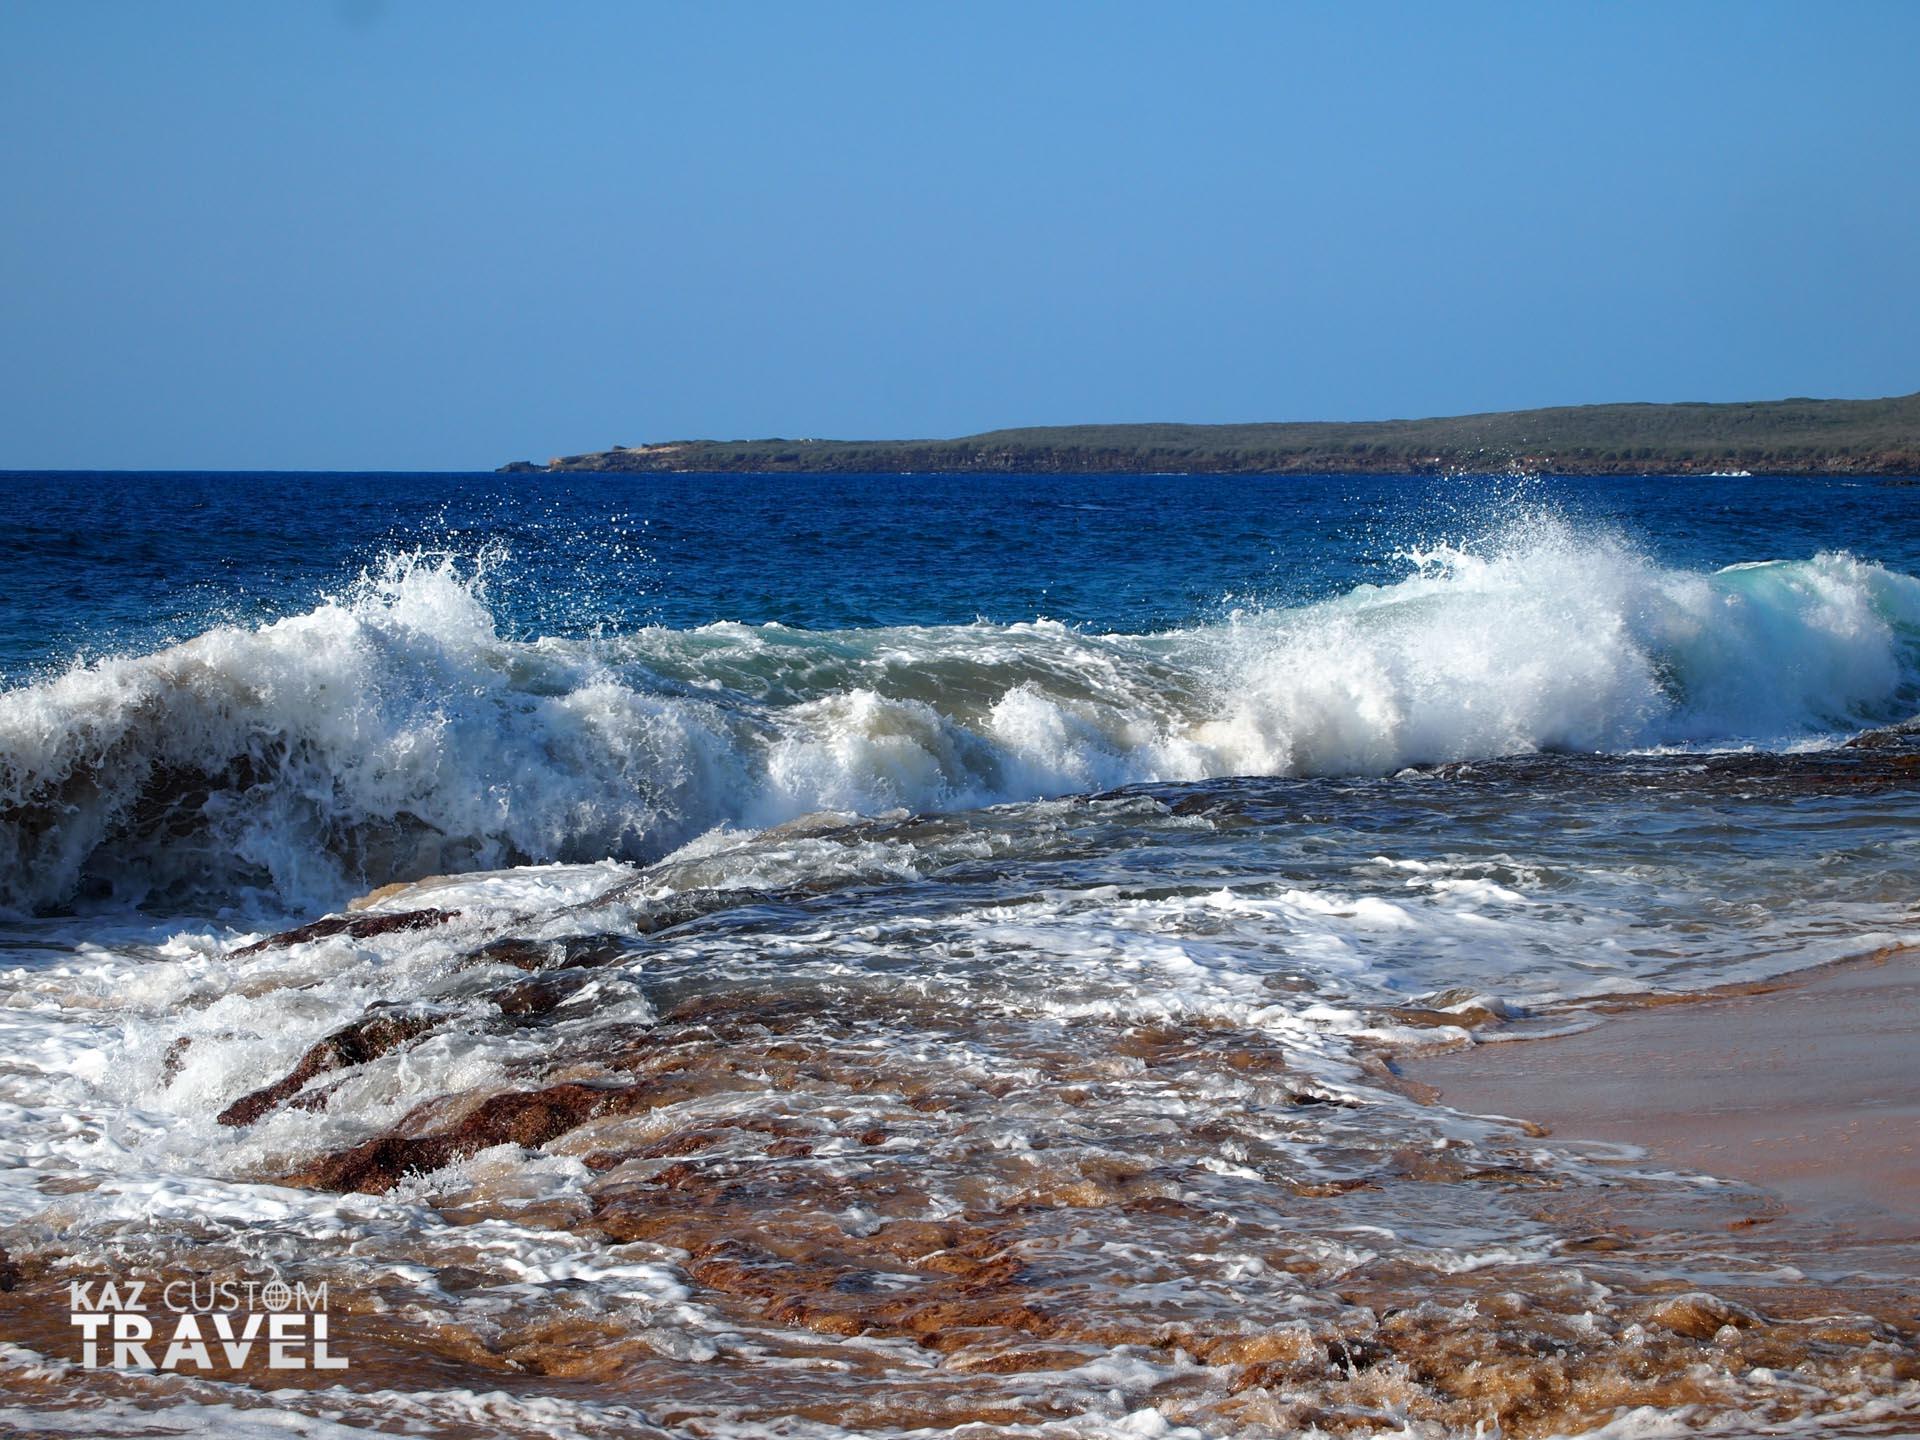 Waves on the beach in Molokai